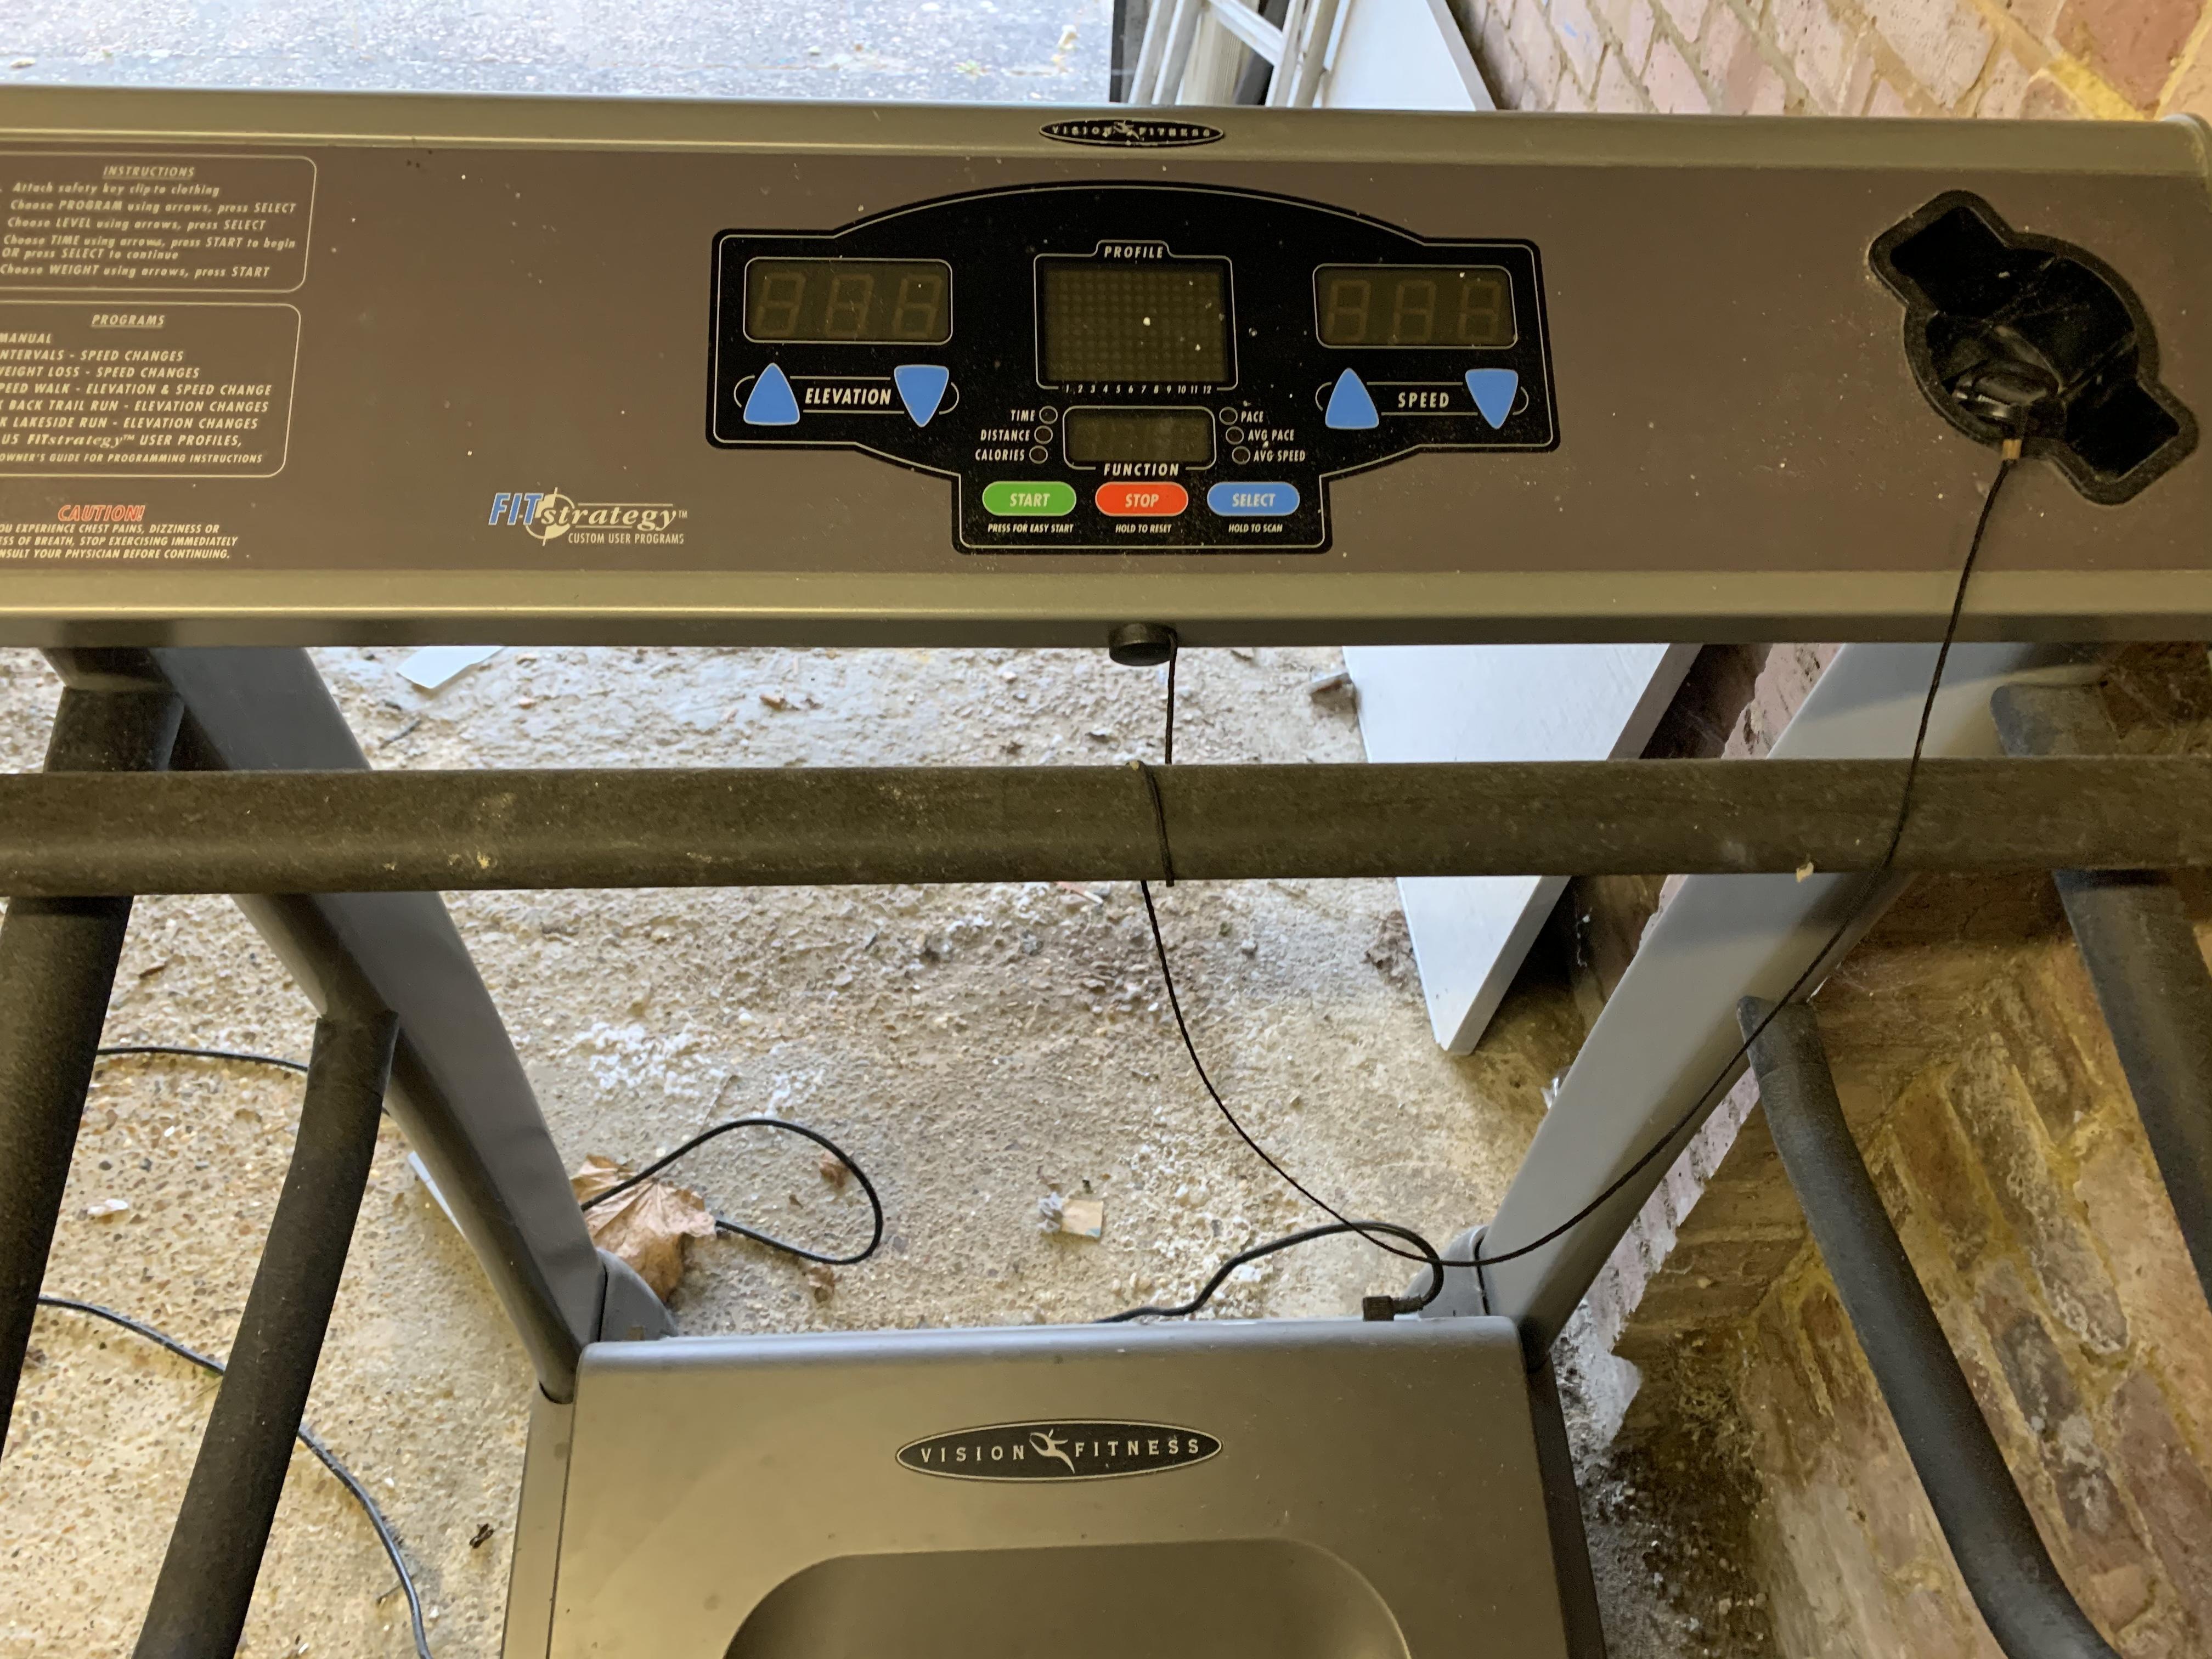 Vision Fitness Professional Treadmill